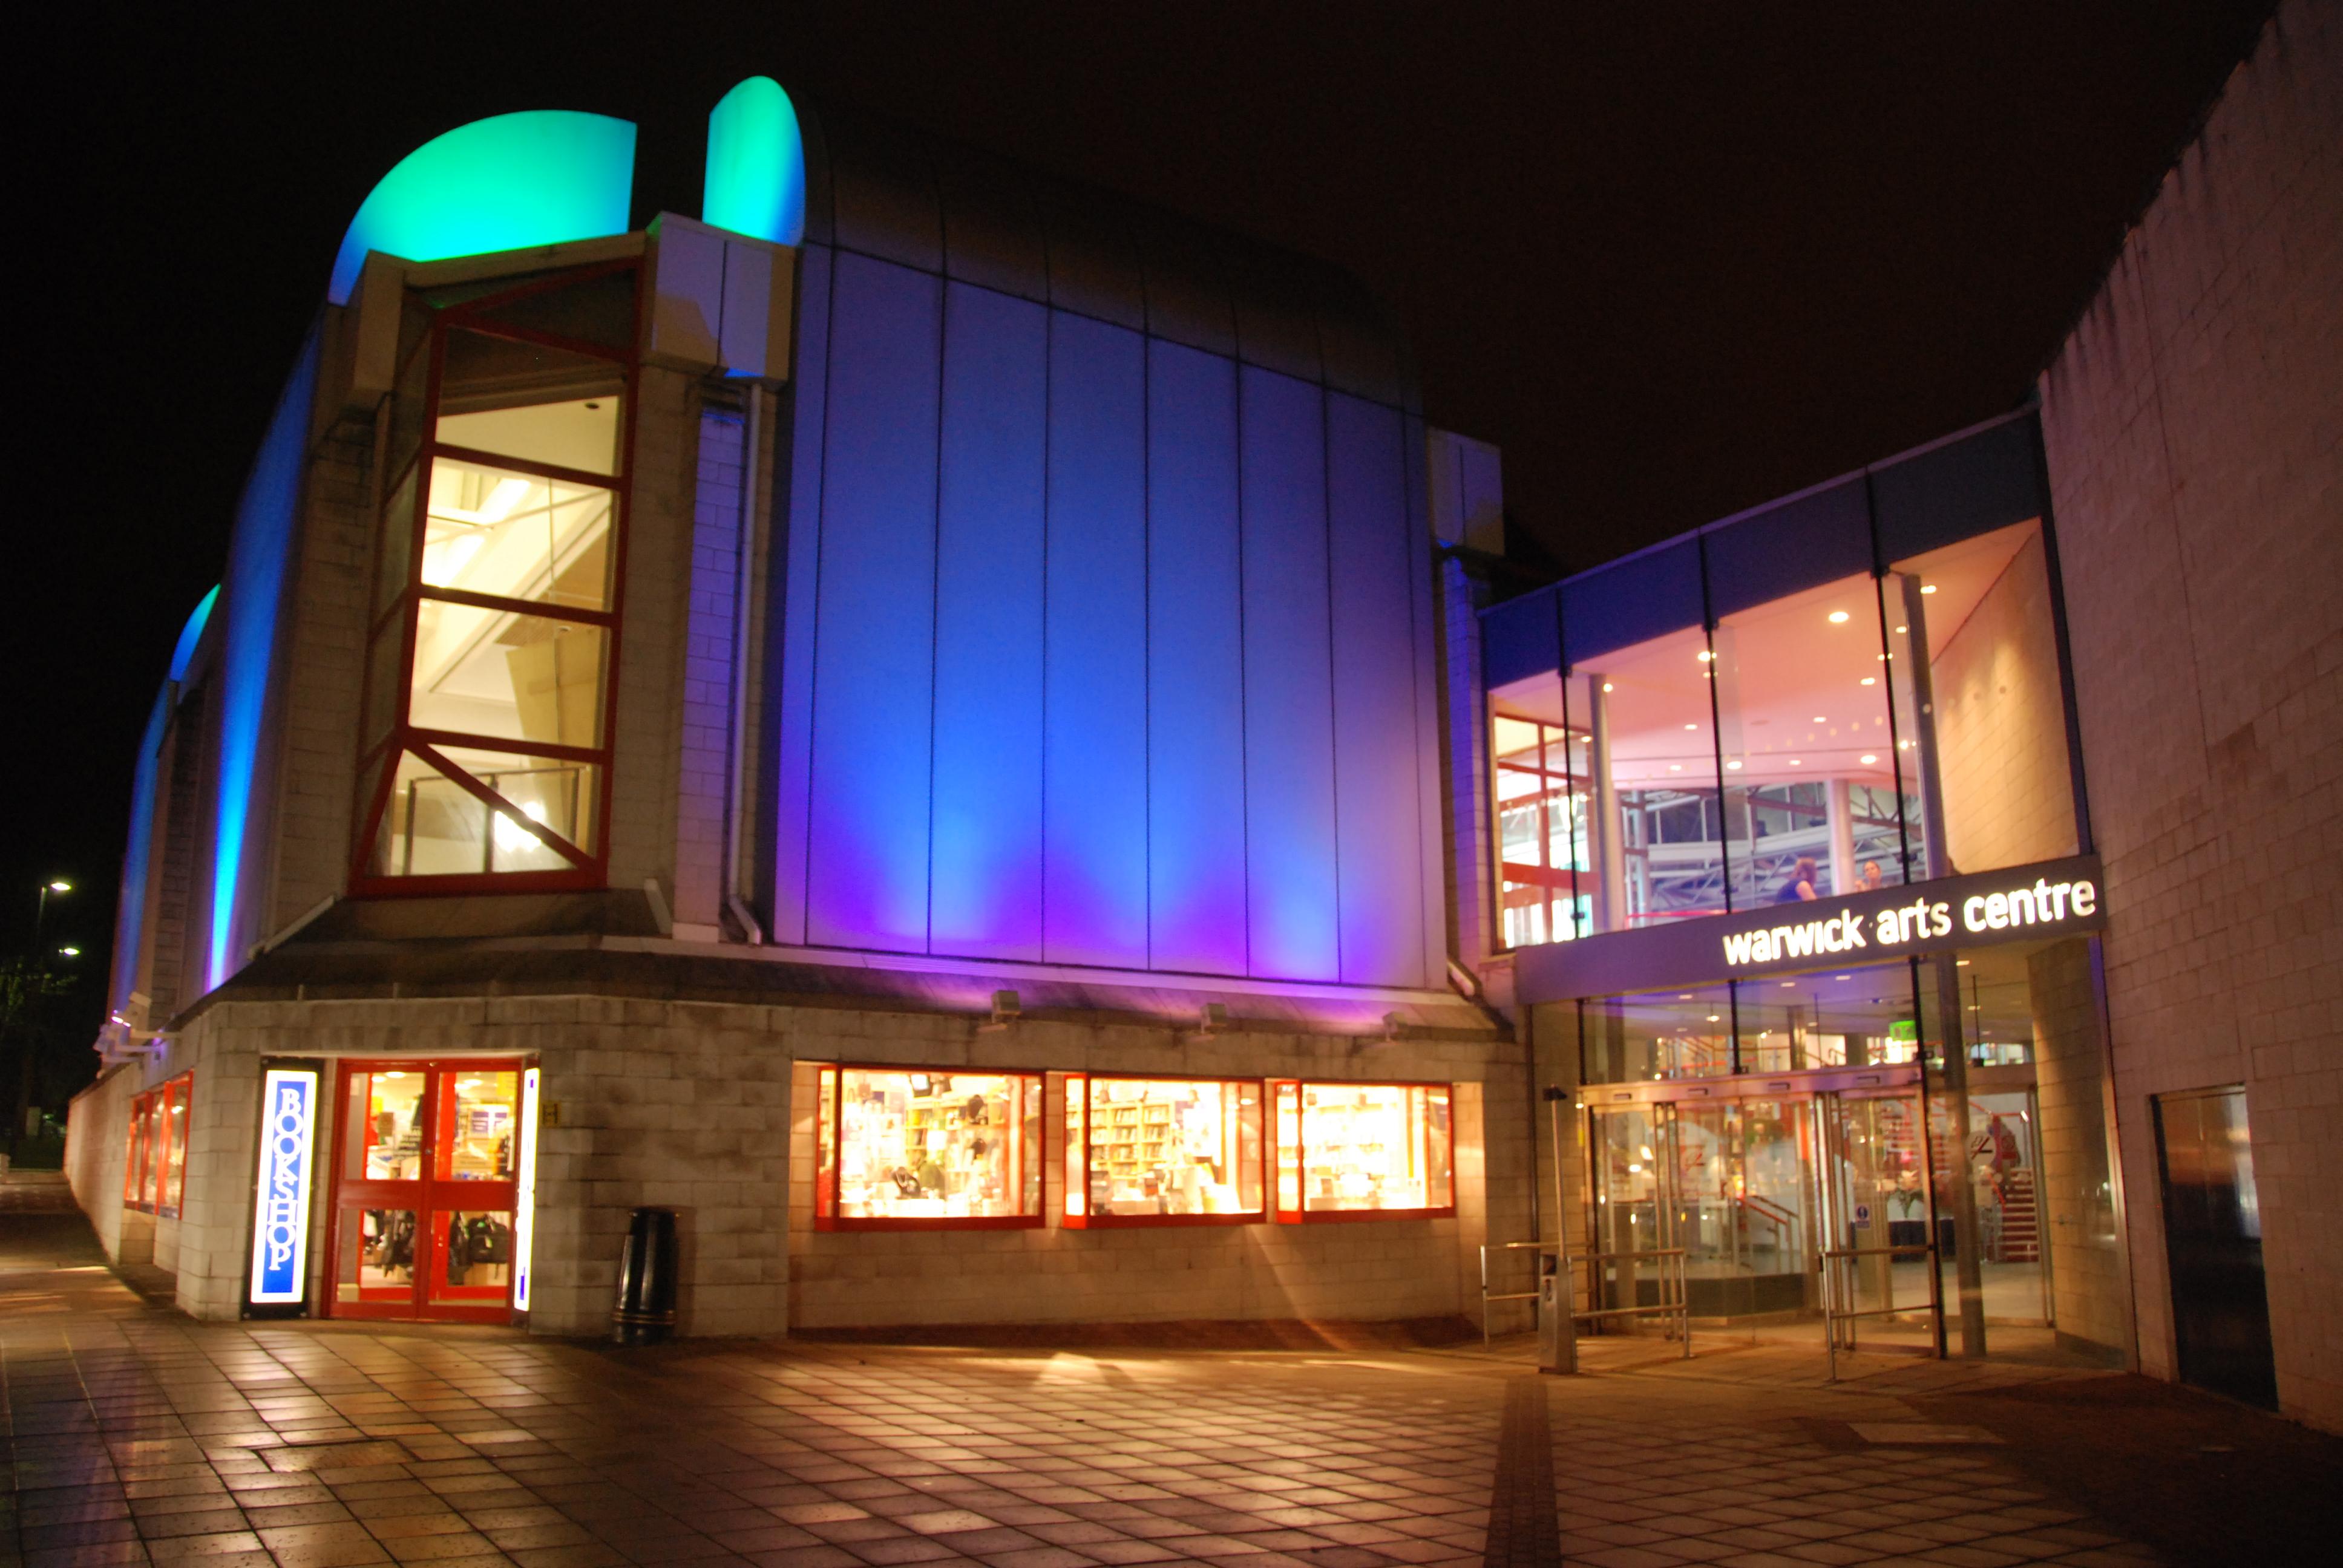 Warwick Art Centre Restaurant